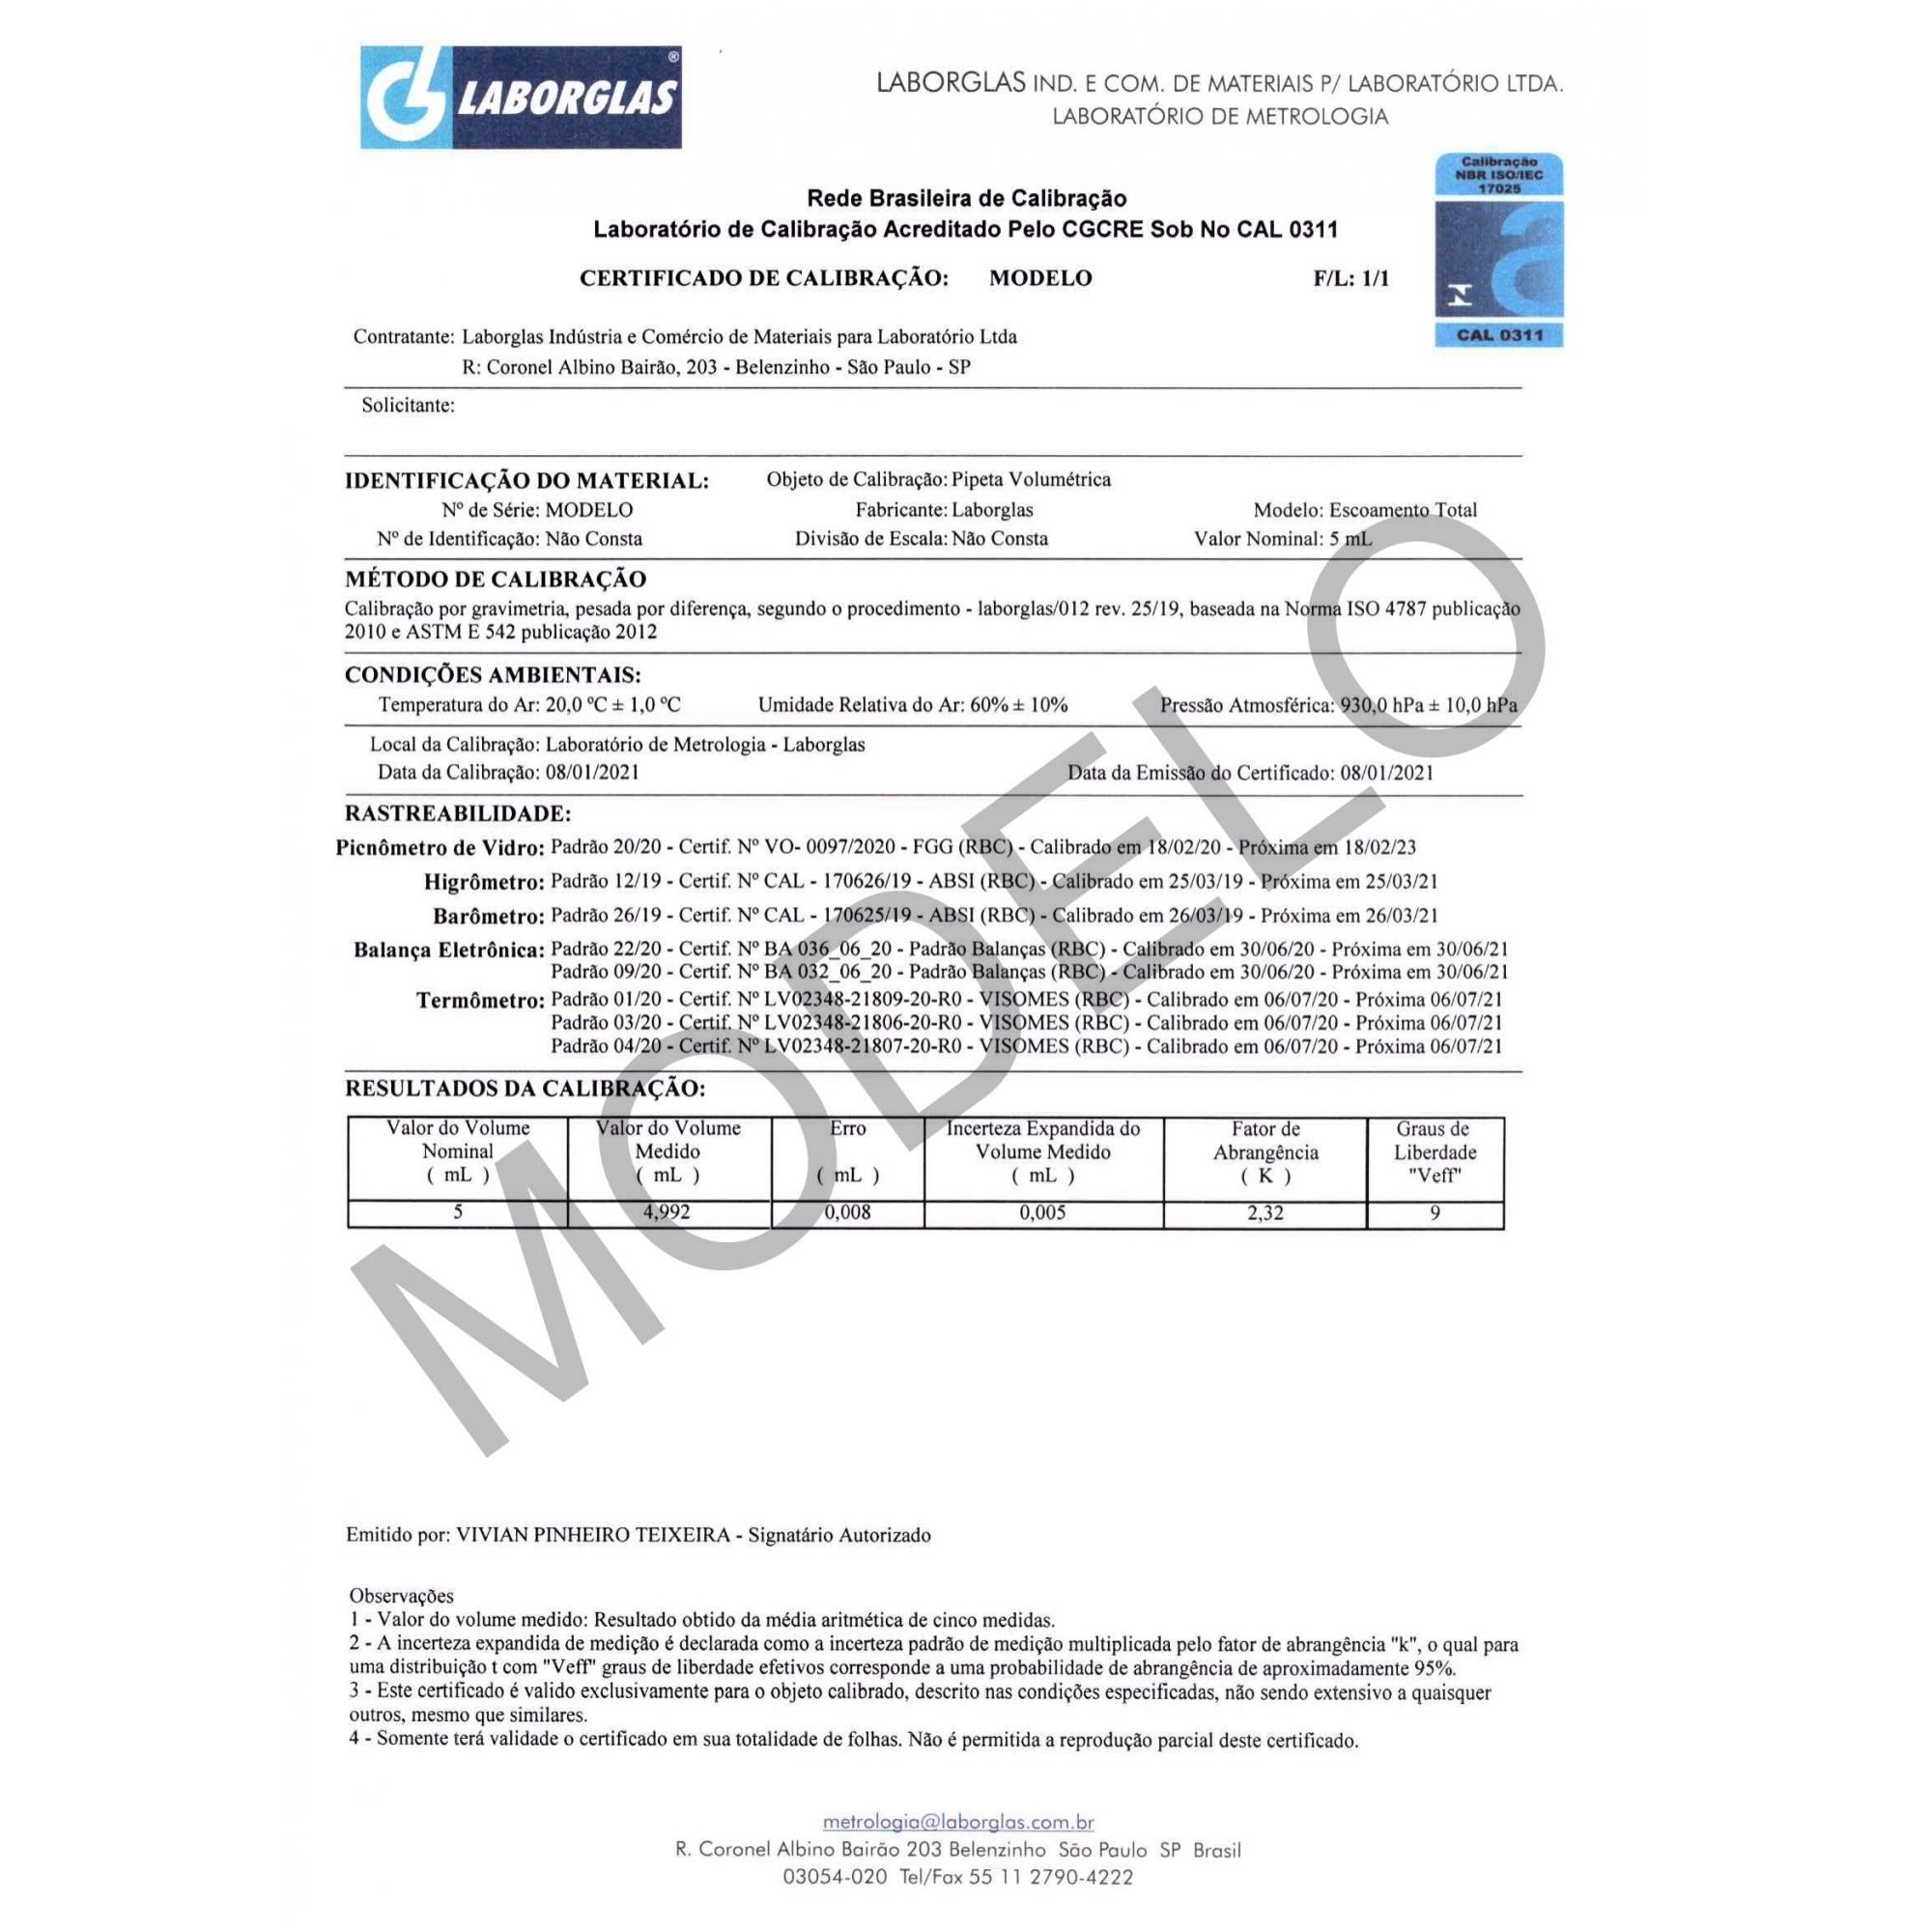 PIPETA VOLUMÉTRICA ESGOTAMENTO TOTAL 40 ML CERTIFICADO RBC - Laborglas - Cód. 9433729-R